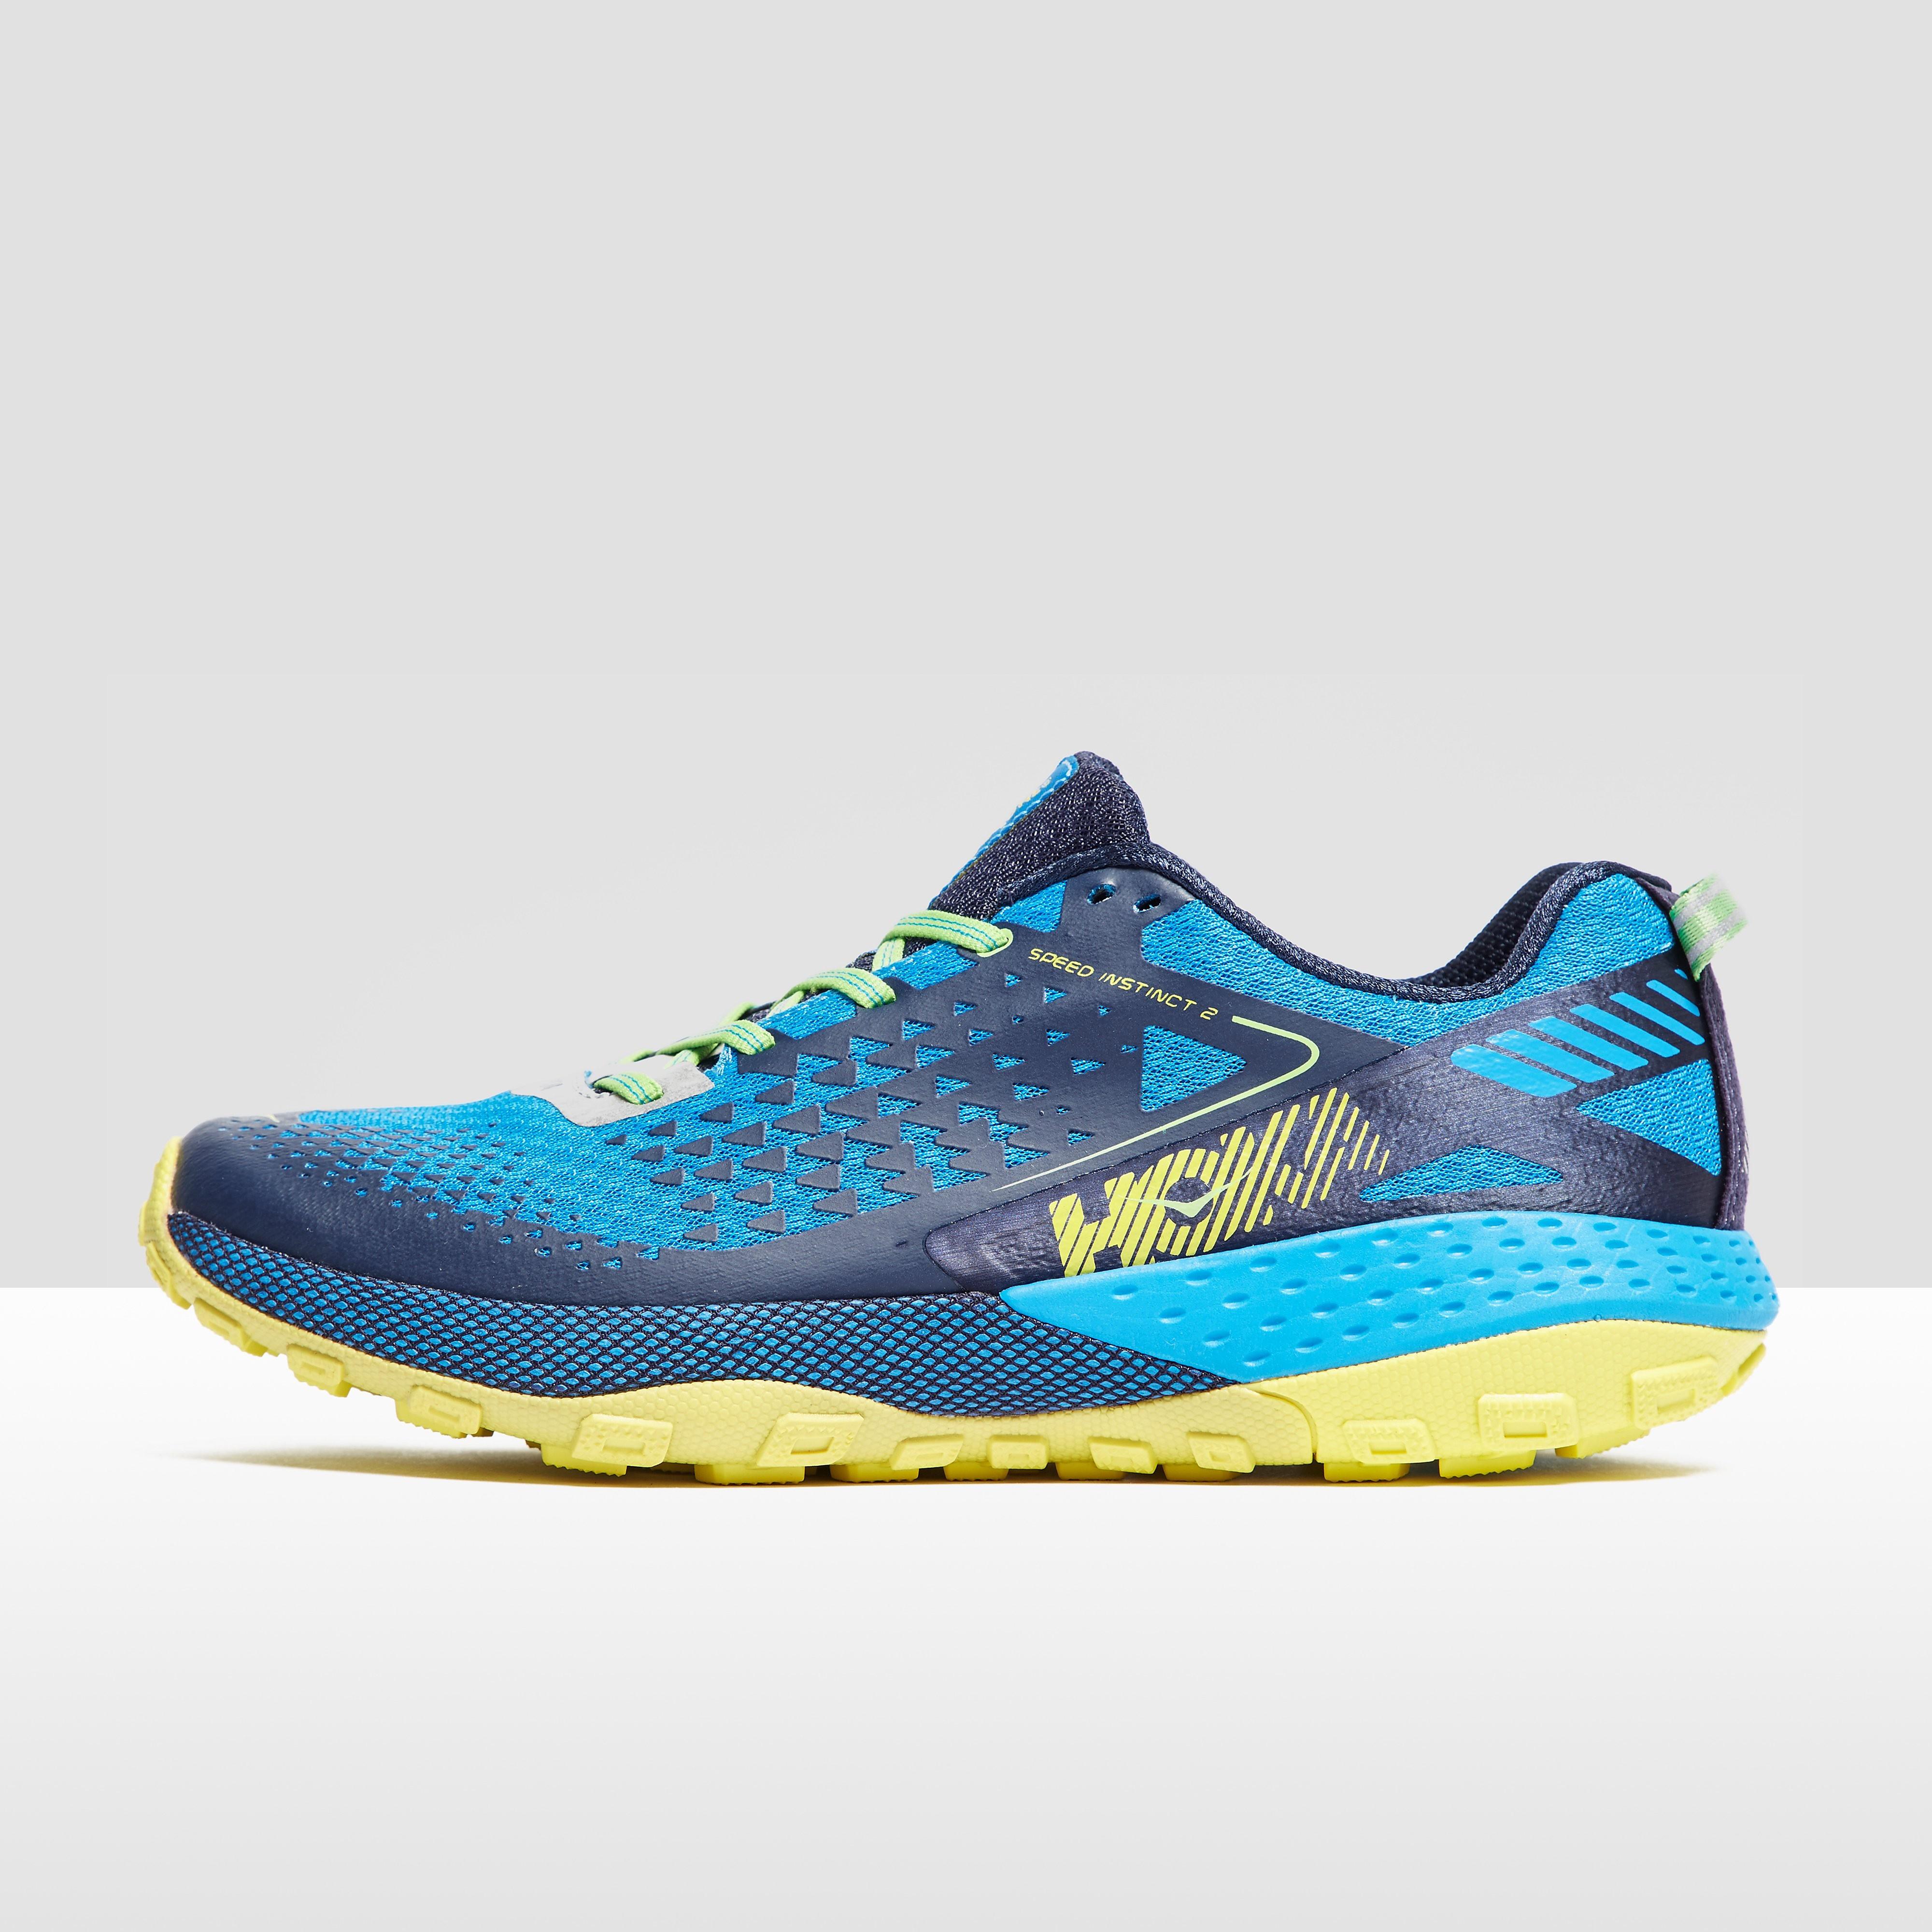 Hoka One One Men's Trail Running Shoe